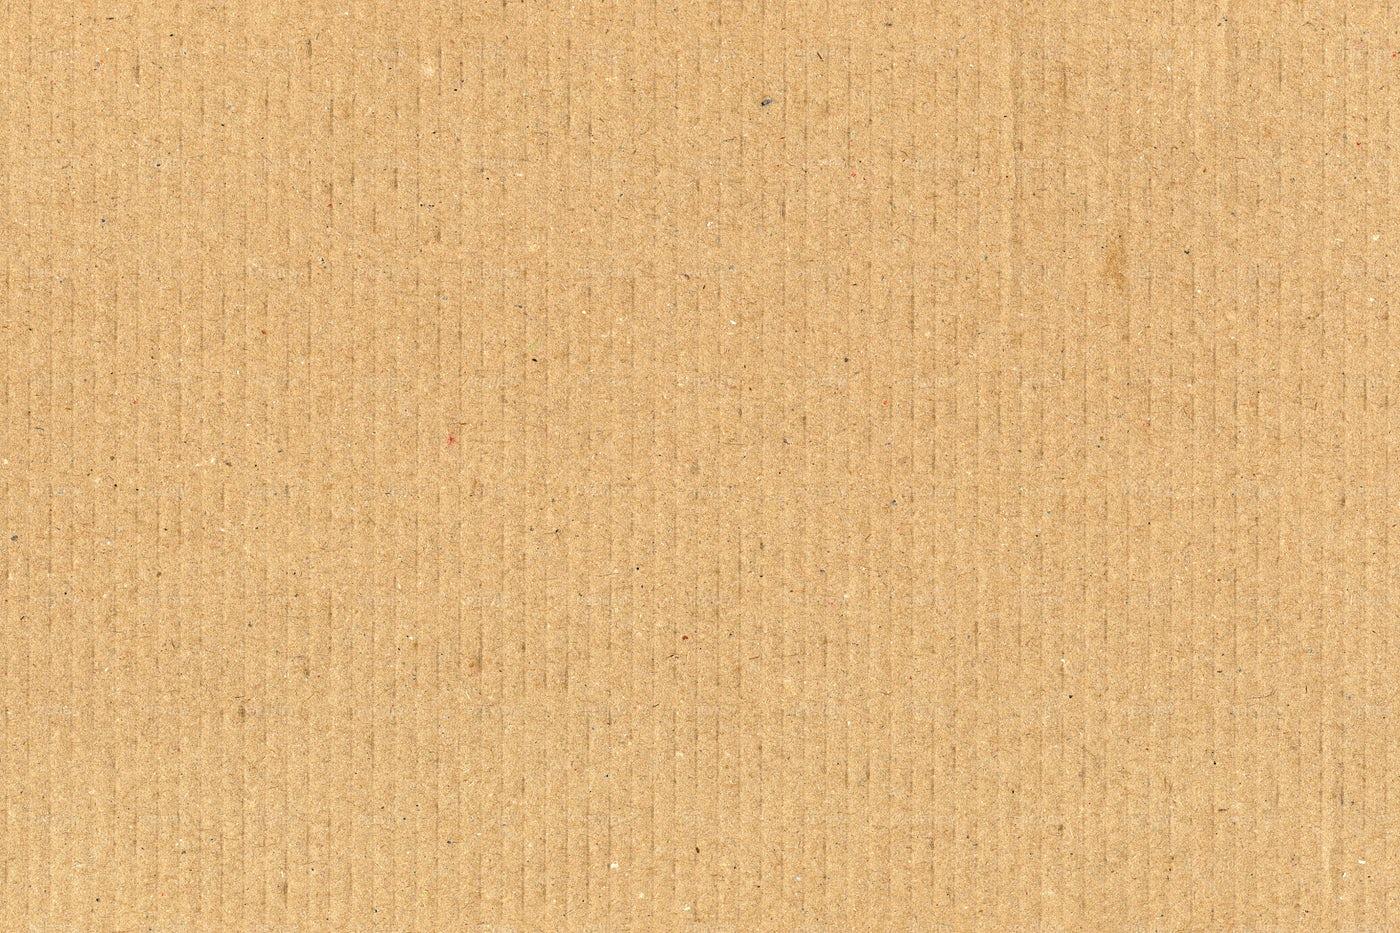 Brown Corrugated Cardboard: Stock Photos